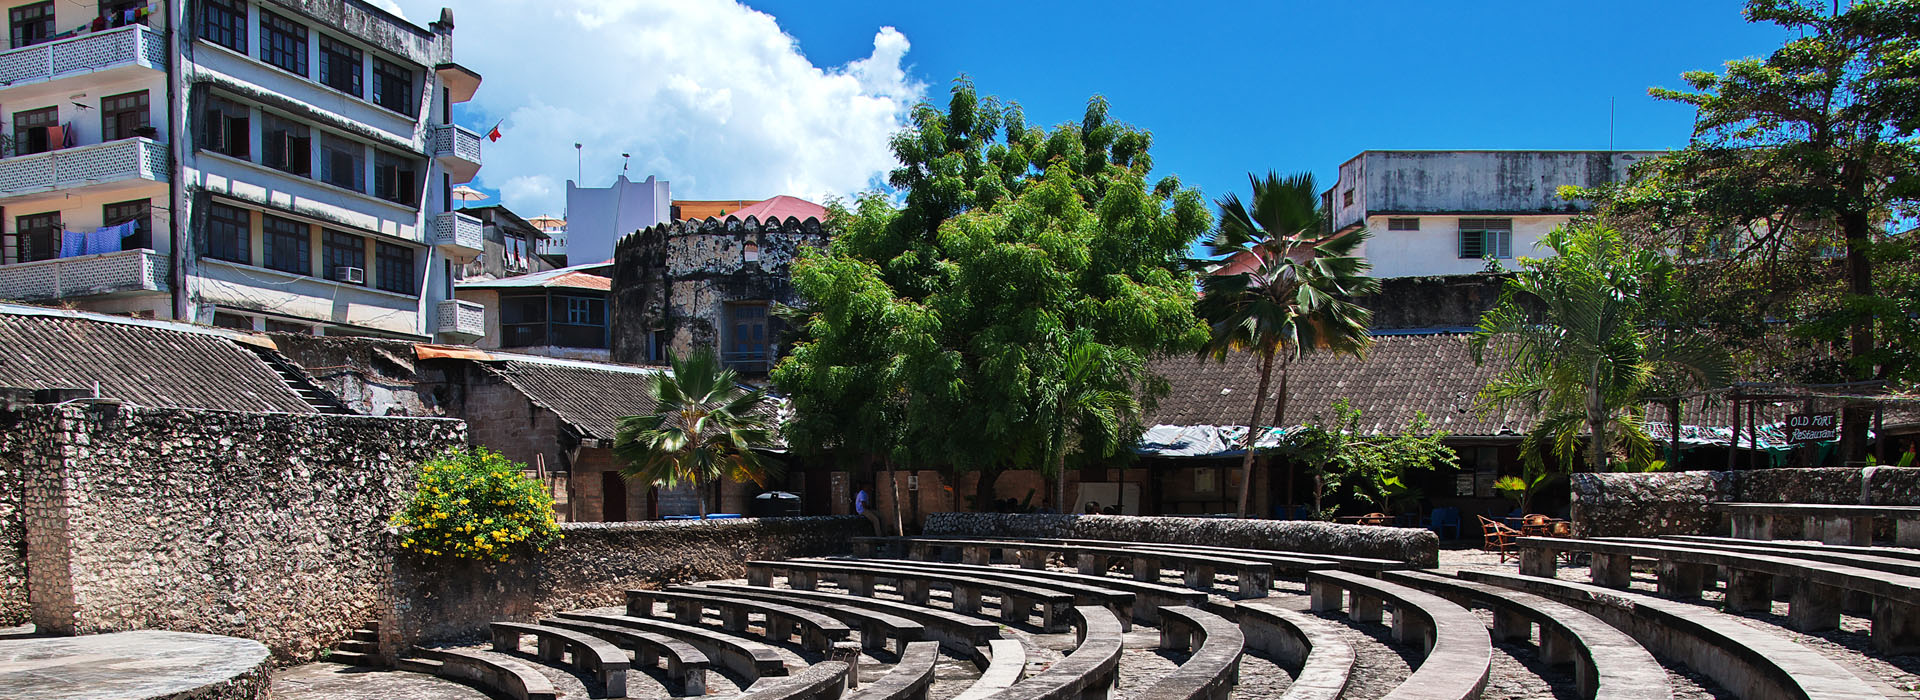 STONE TOWN - Zanzibar Top Destination - African Adventure Specialists